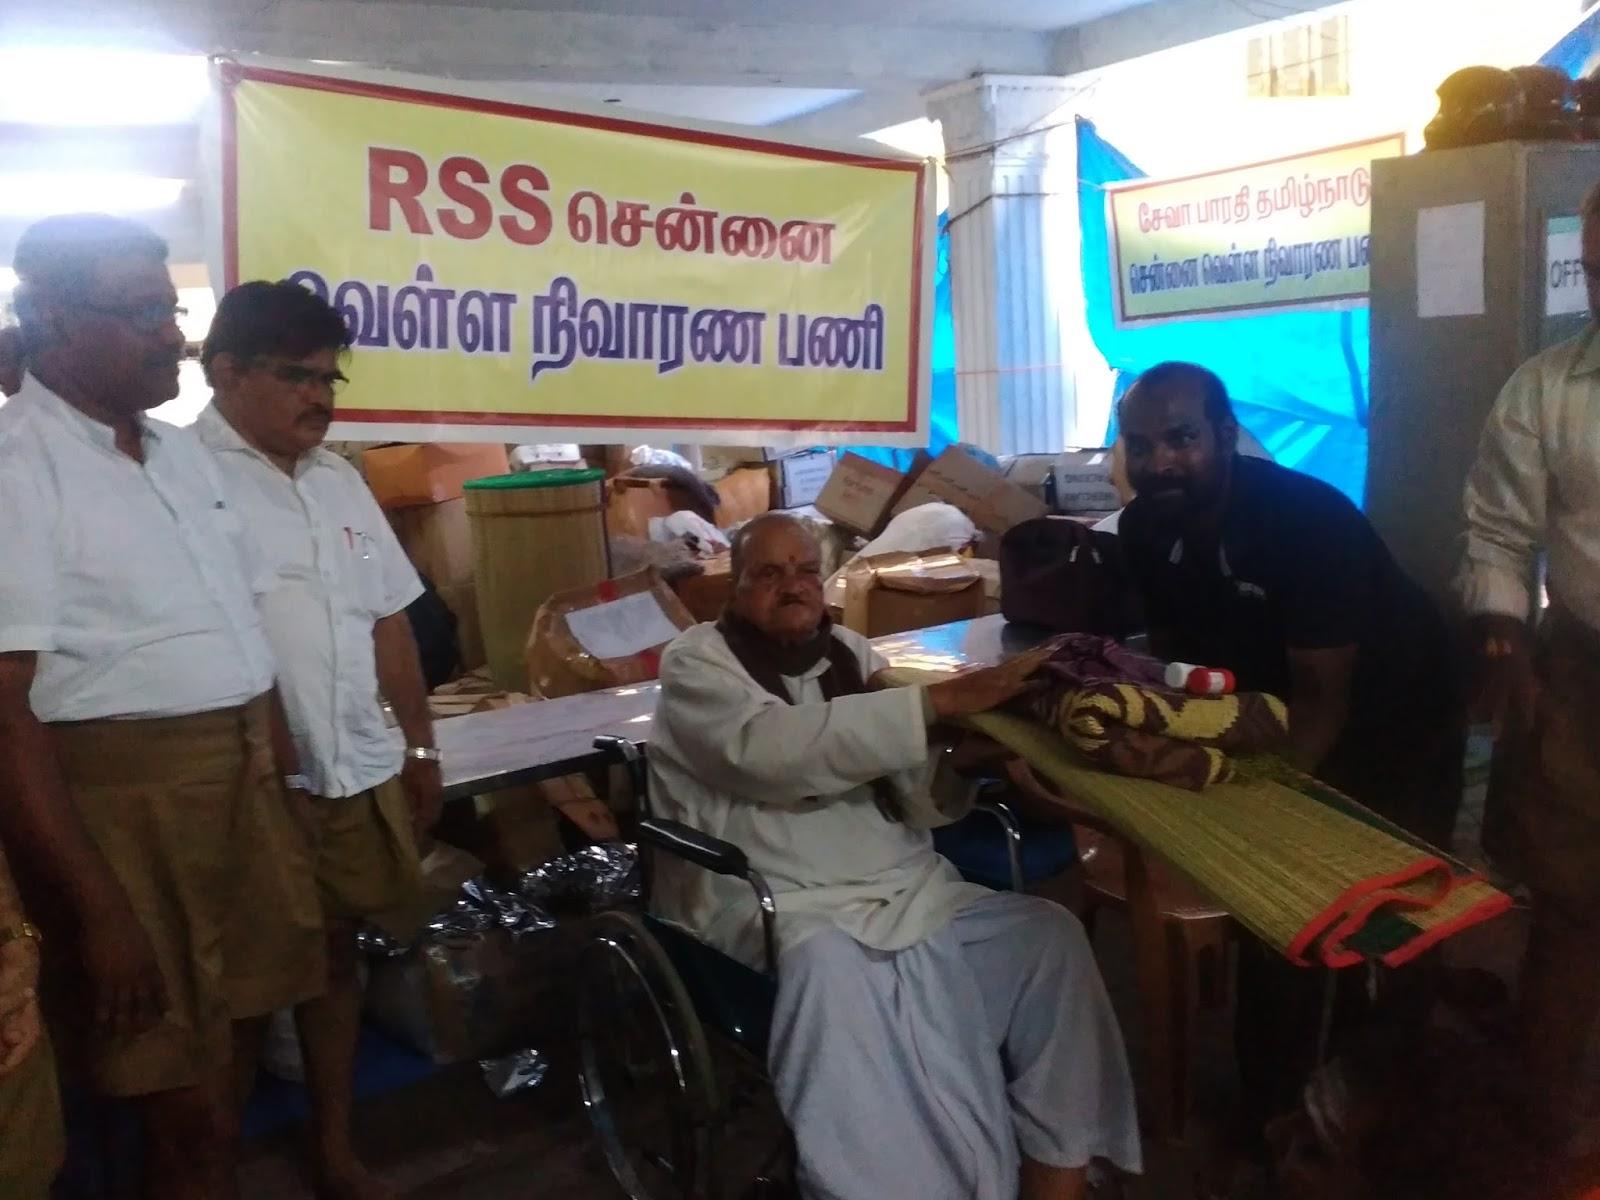 RSSS Veteran K Suryanarayan Rao joined RSS Post-rain flood relief activities in Chennai